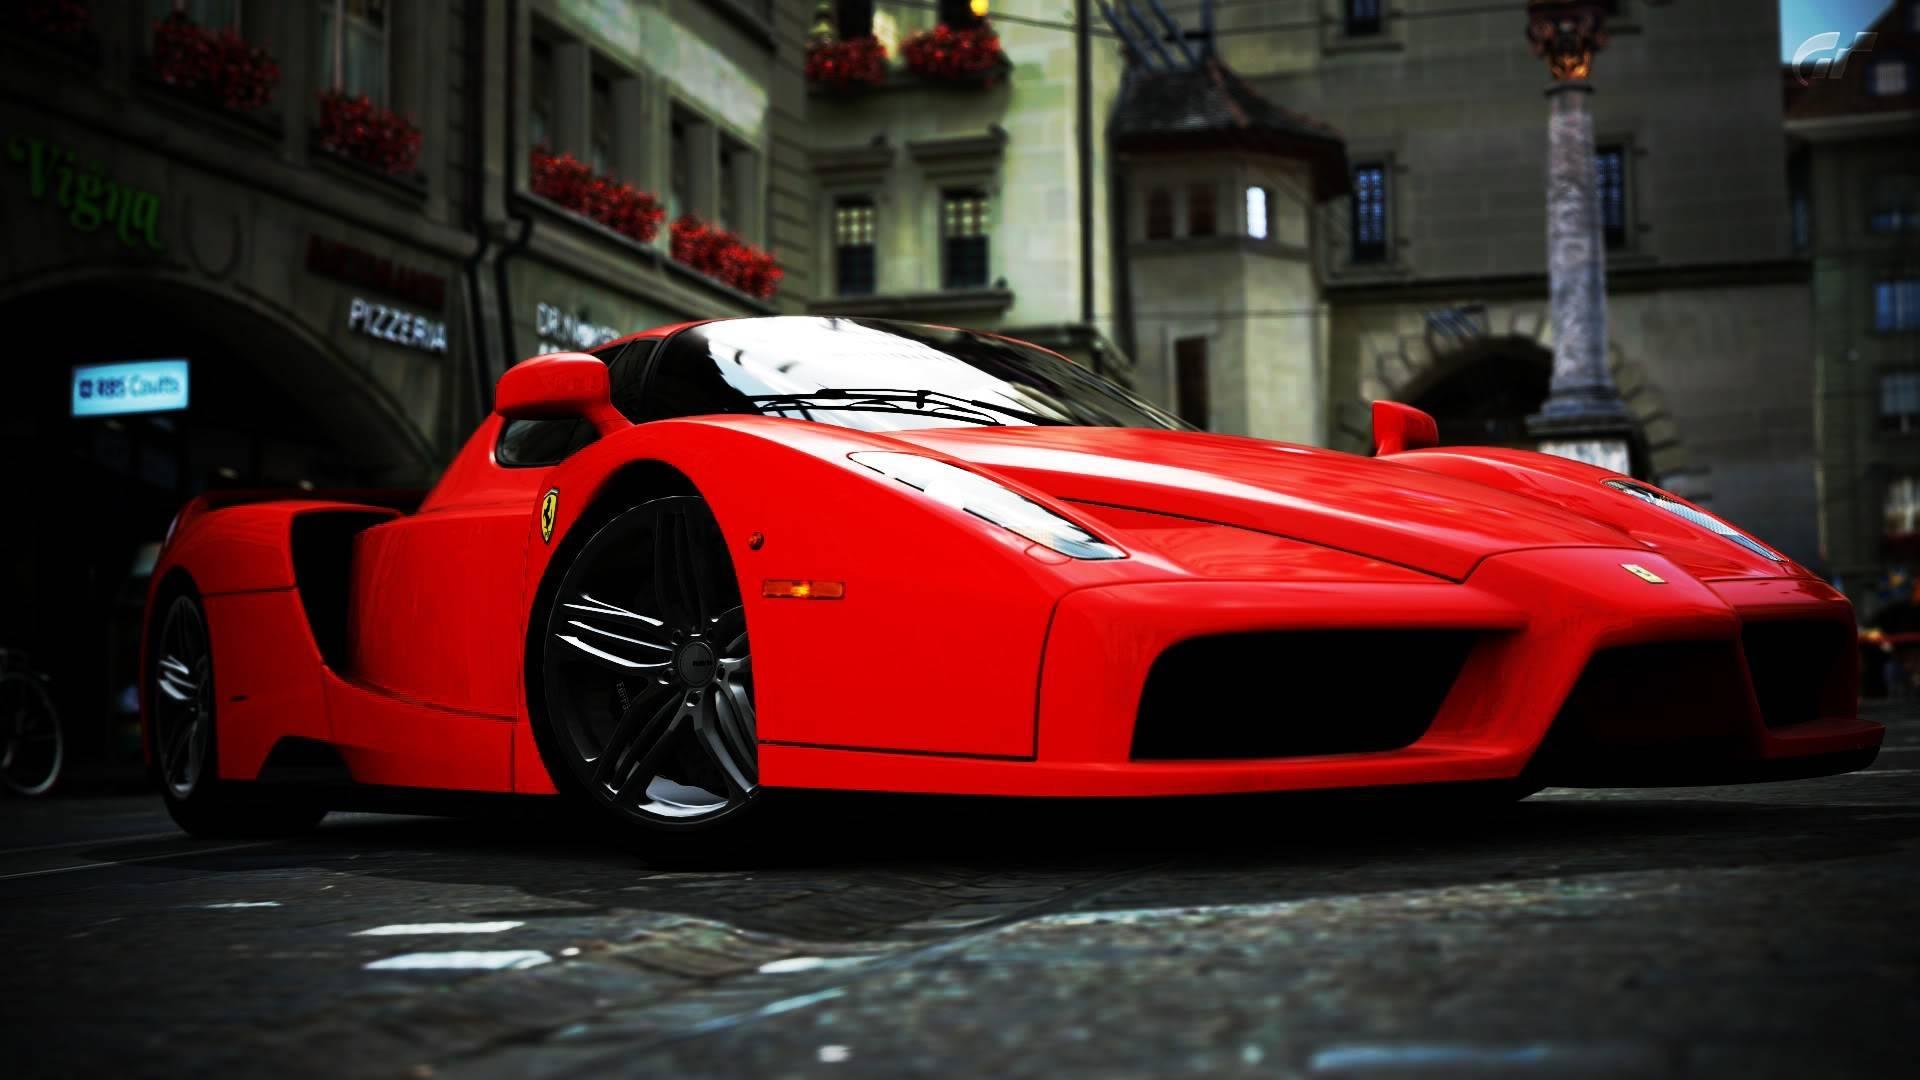 Ferrari Hd 1920x1080 Wallpapers: Ferrari Enzo Wallpapers